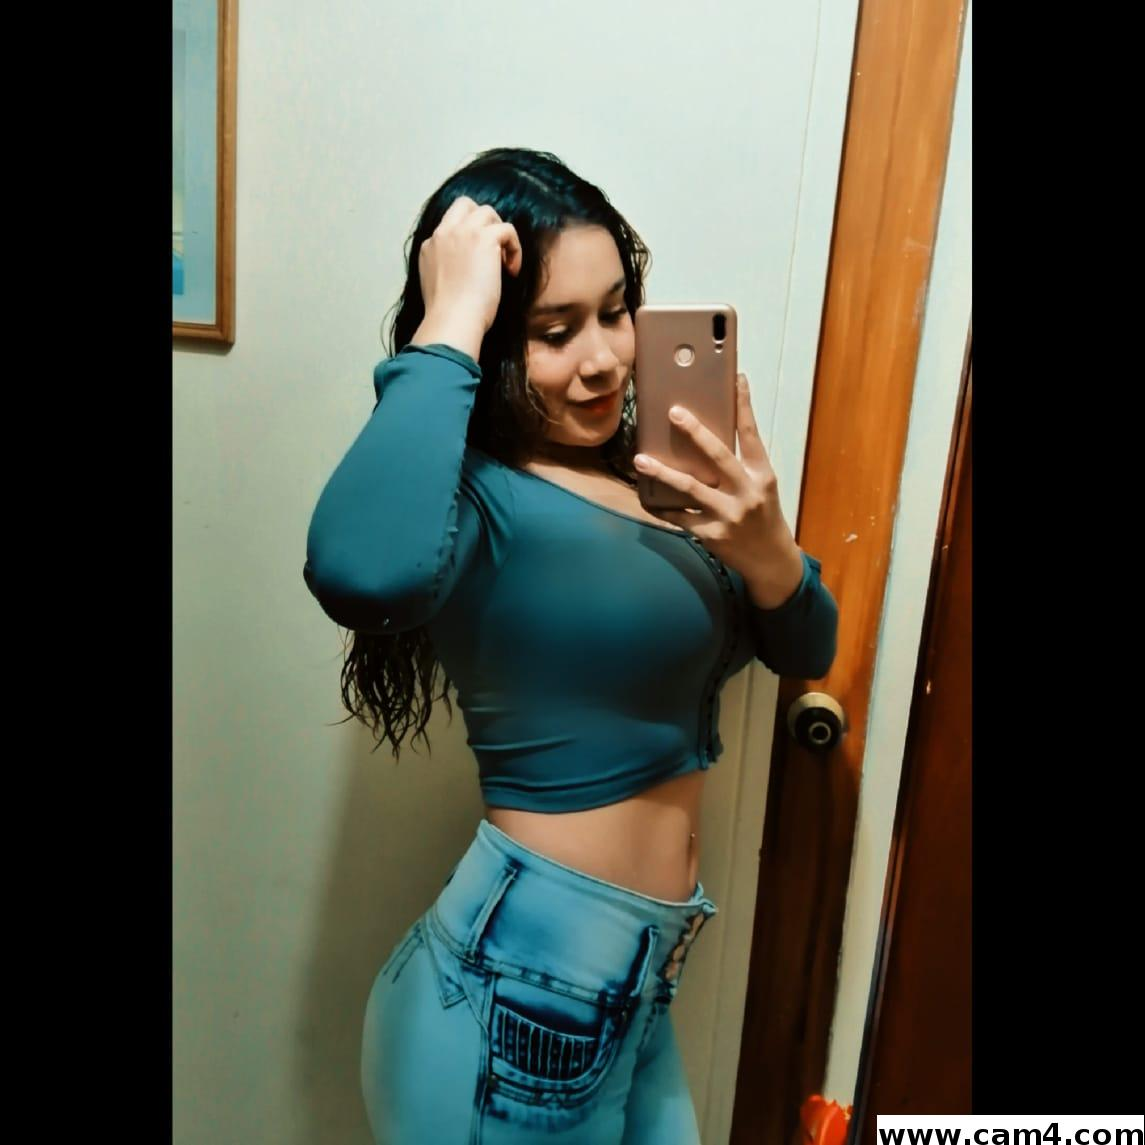 Samantha3 ?s=qdcbcxjxnumlrcbcqchod9sxqpfh8ya1v+p0xkwrn5w=